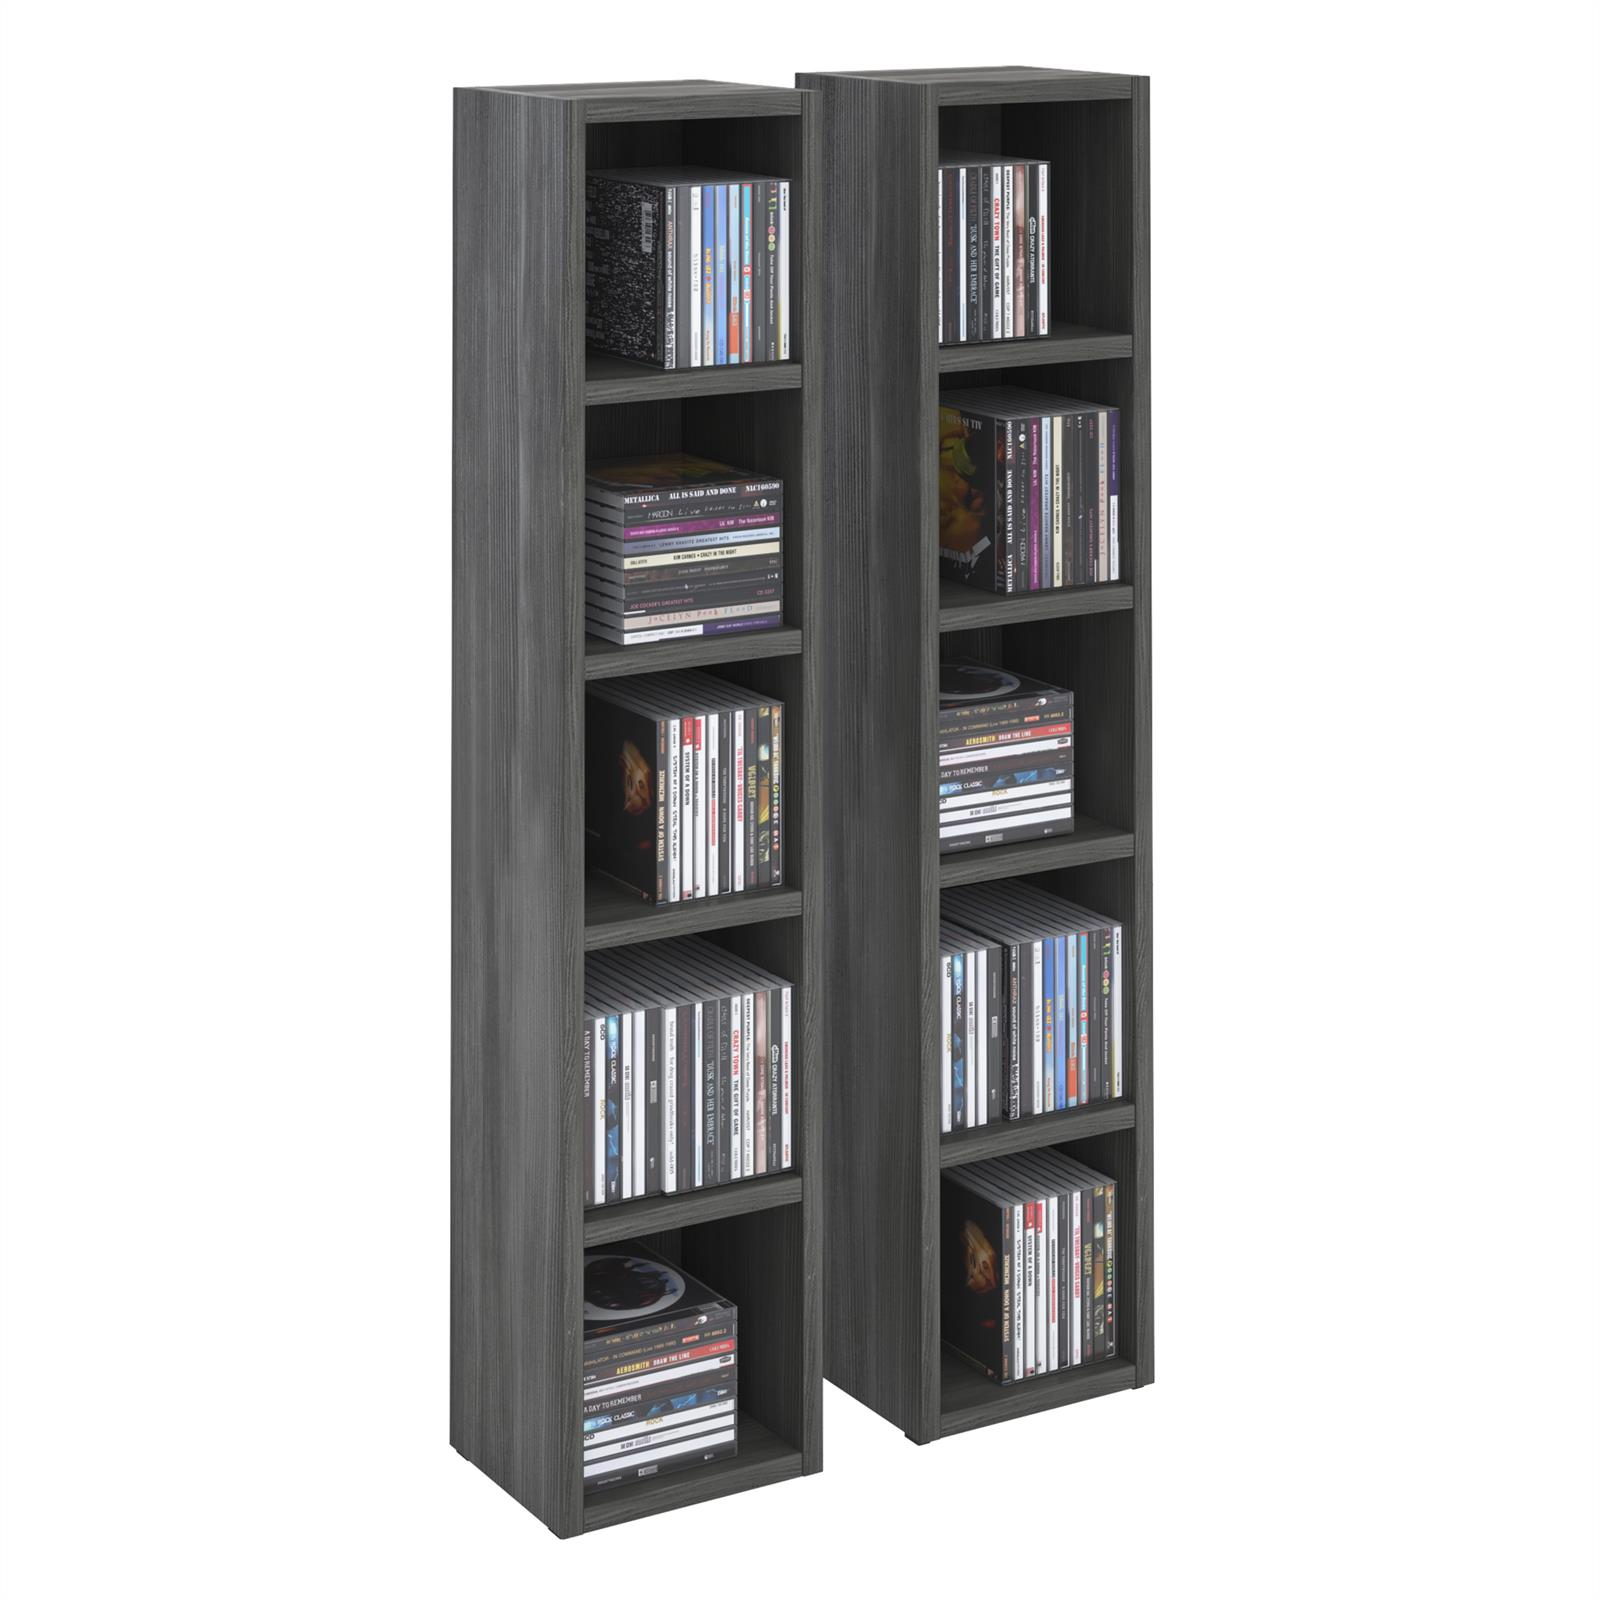 cd dvd regal chart mit 10 f chern in esche grau caro m bel. Black Bedroom Furniture Sets. Home Design Ideas